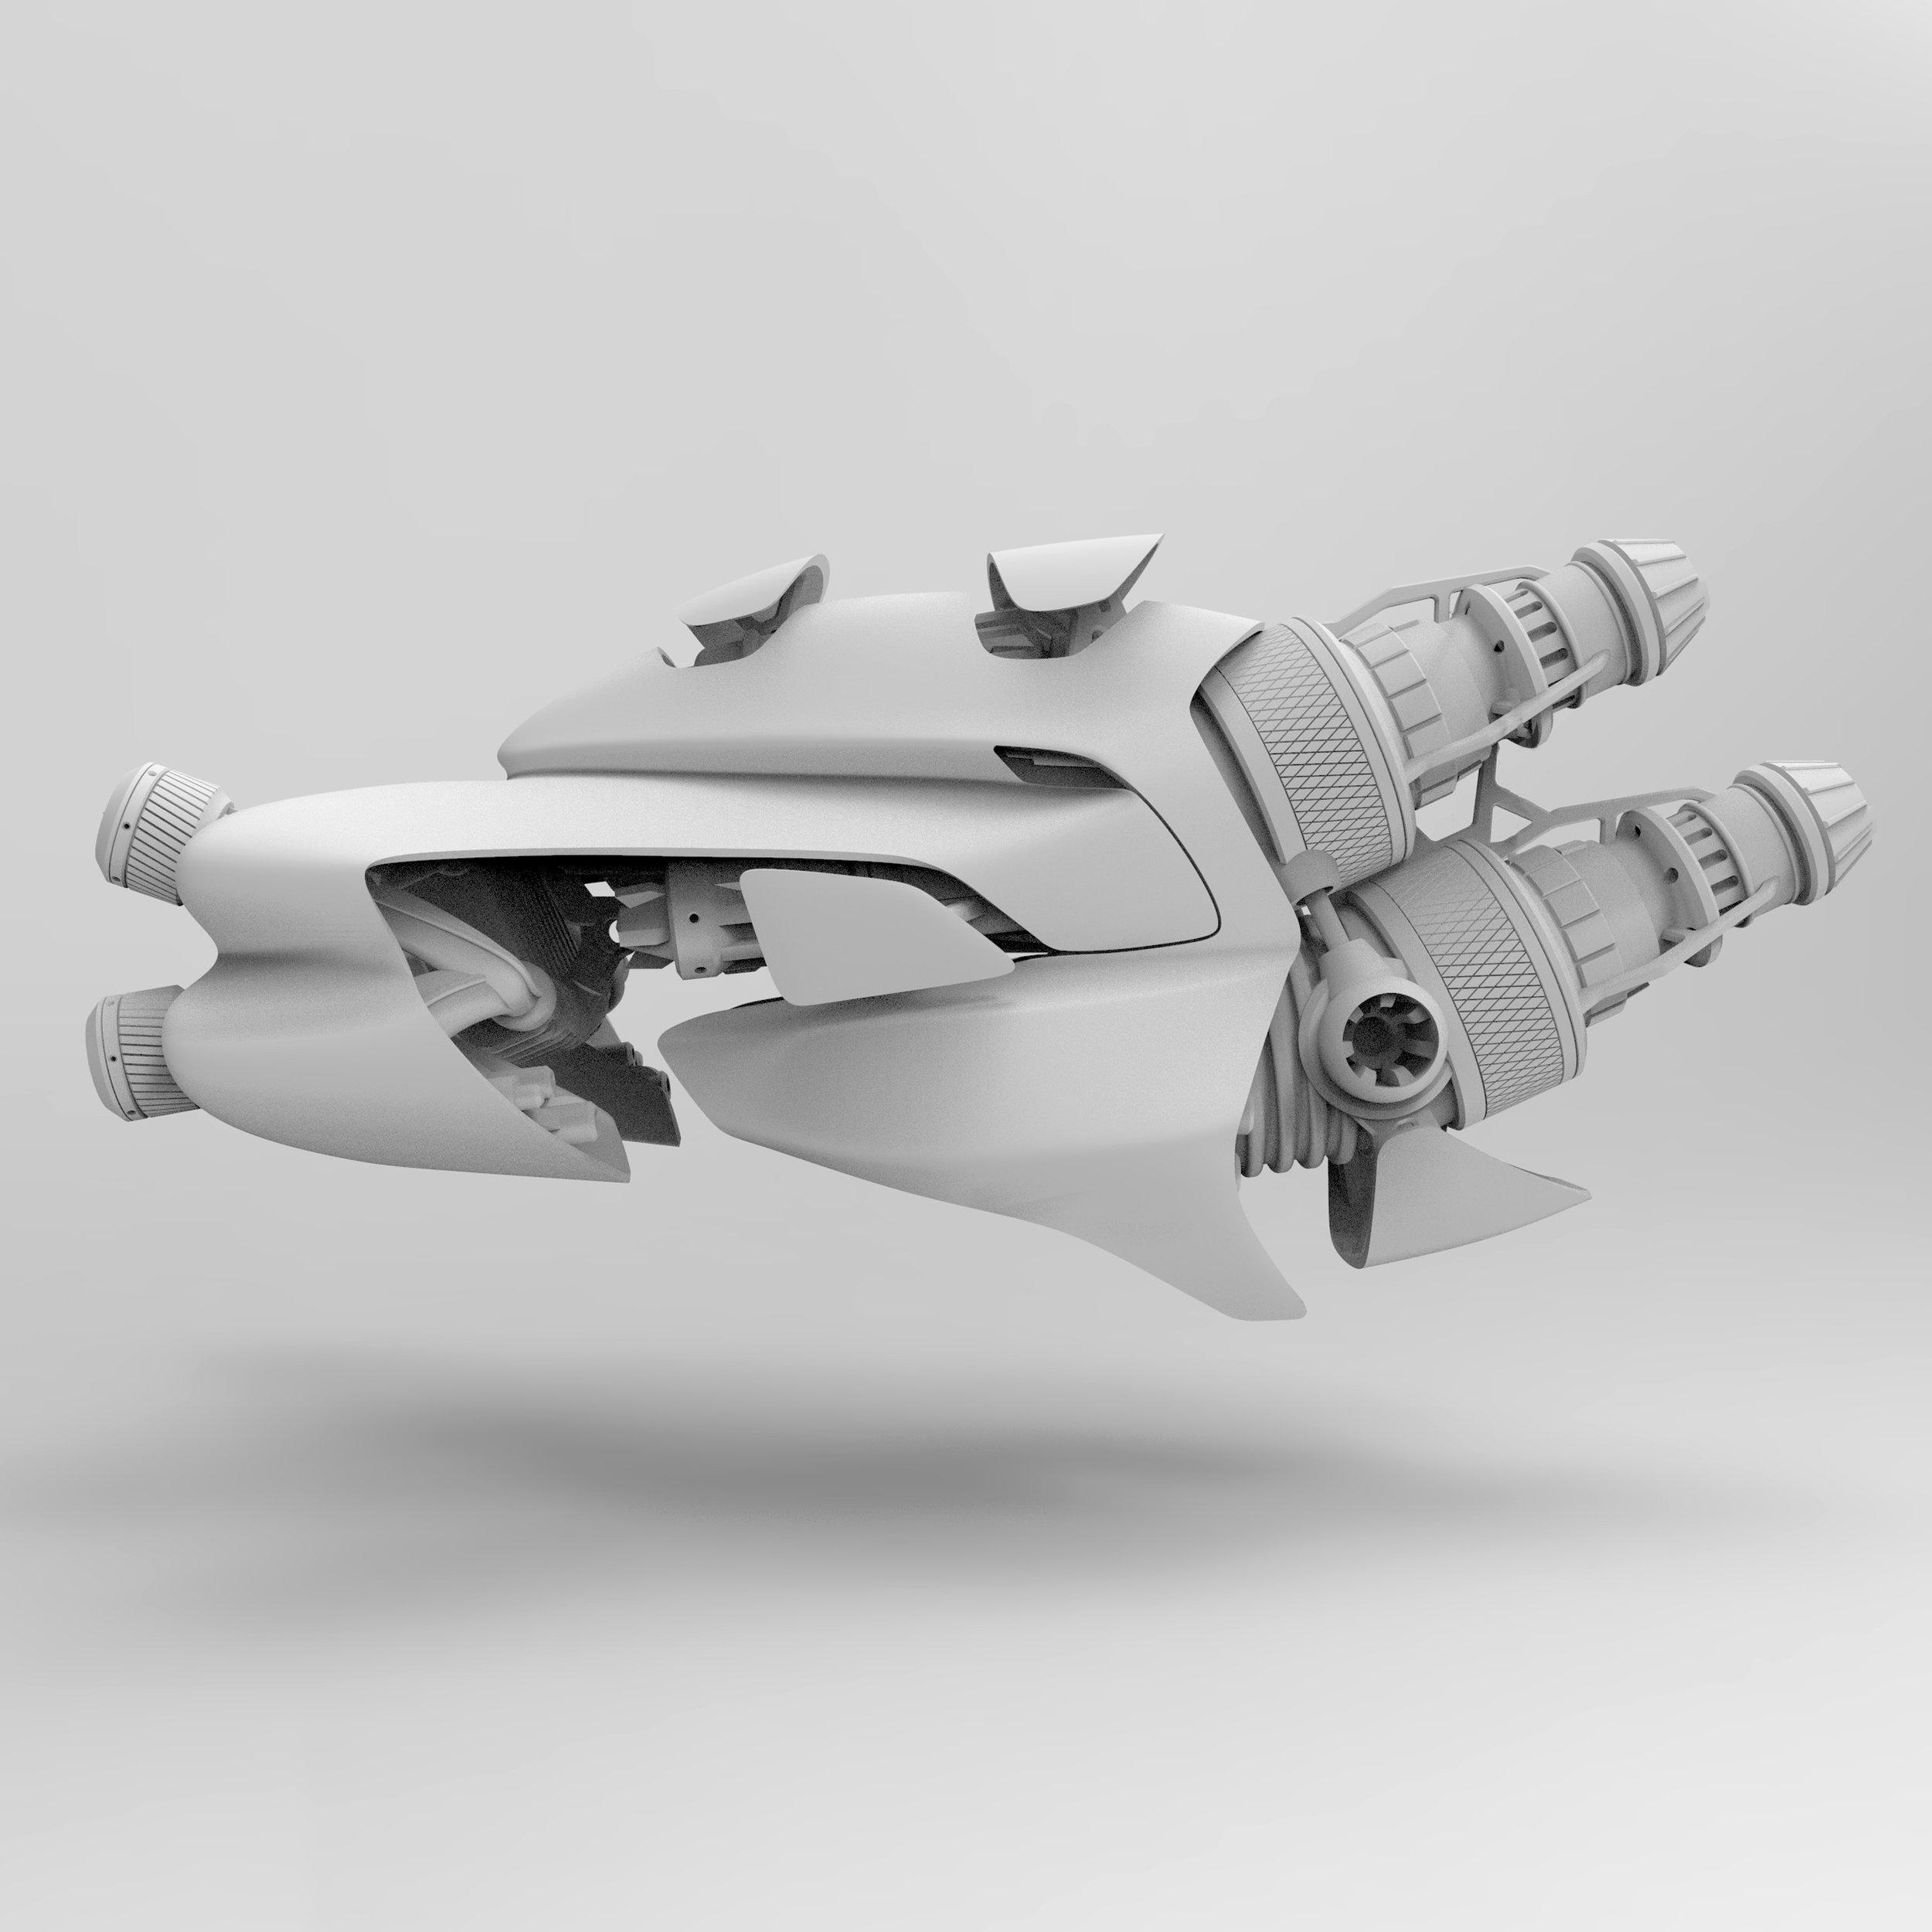 drone_3d_03.jpg